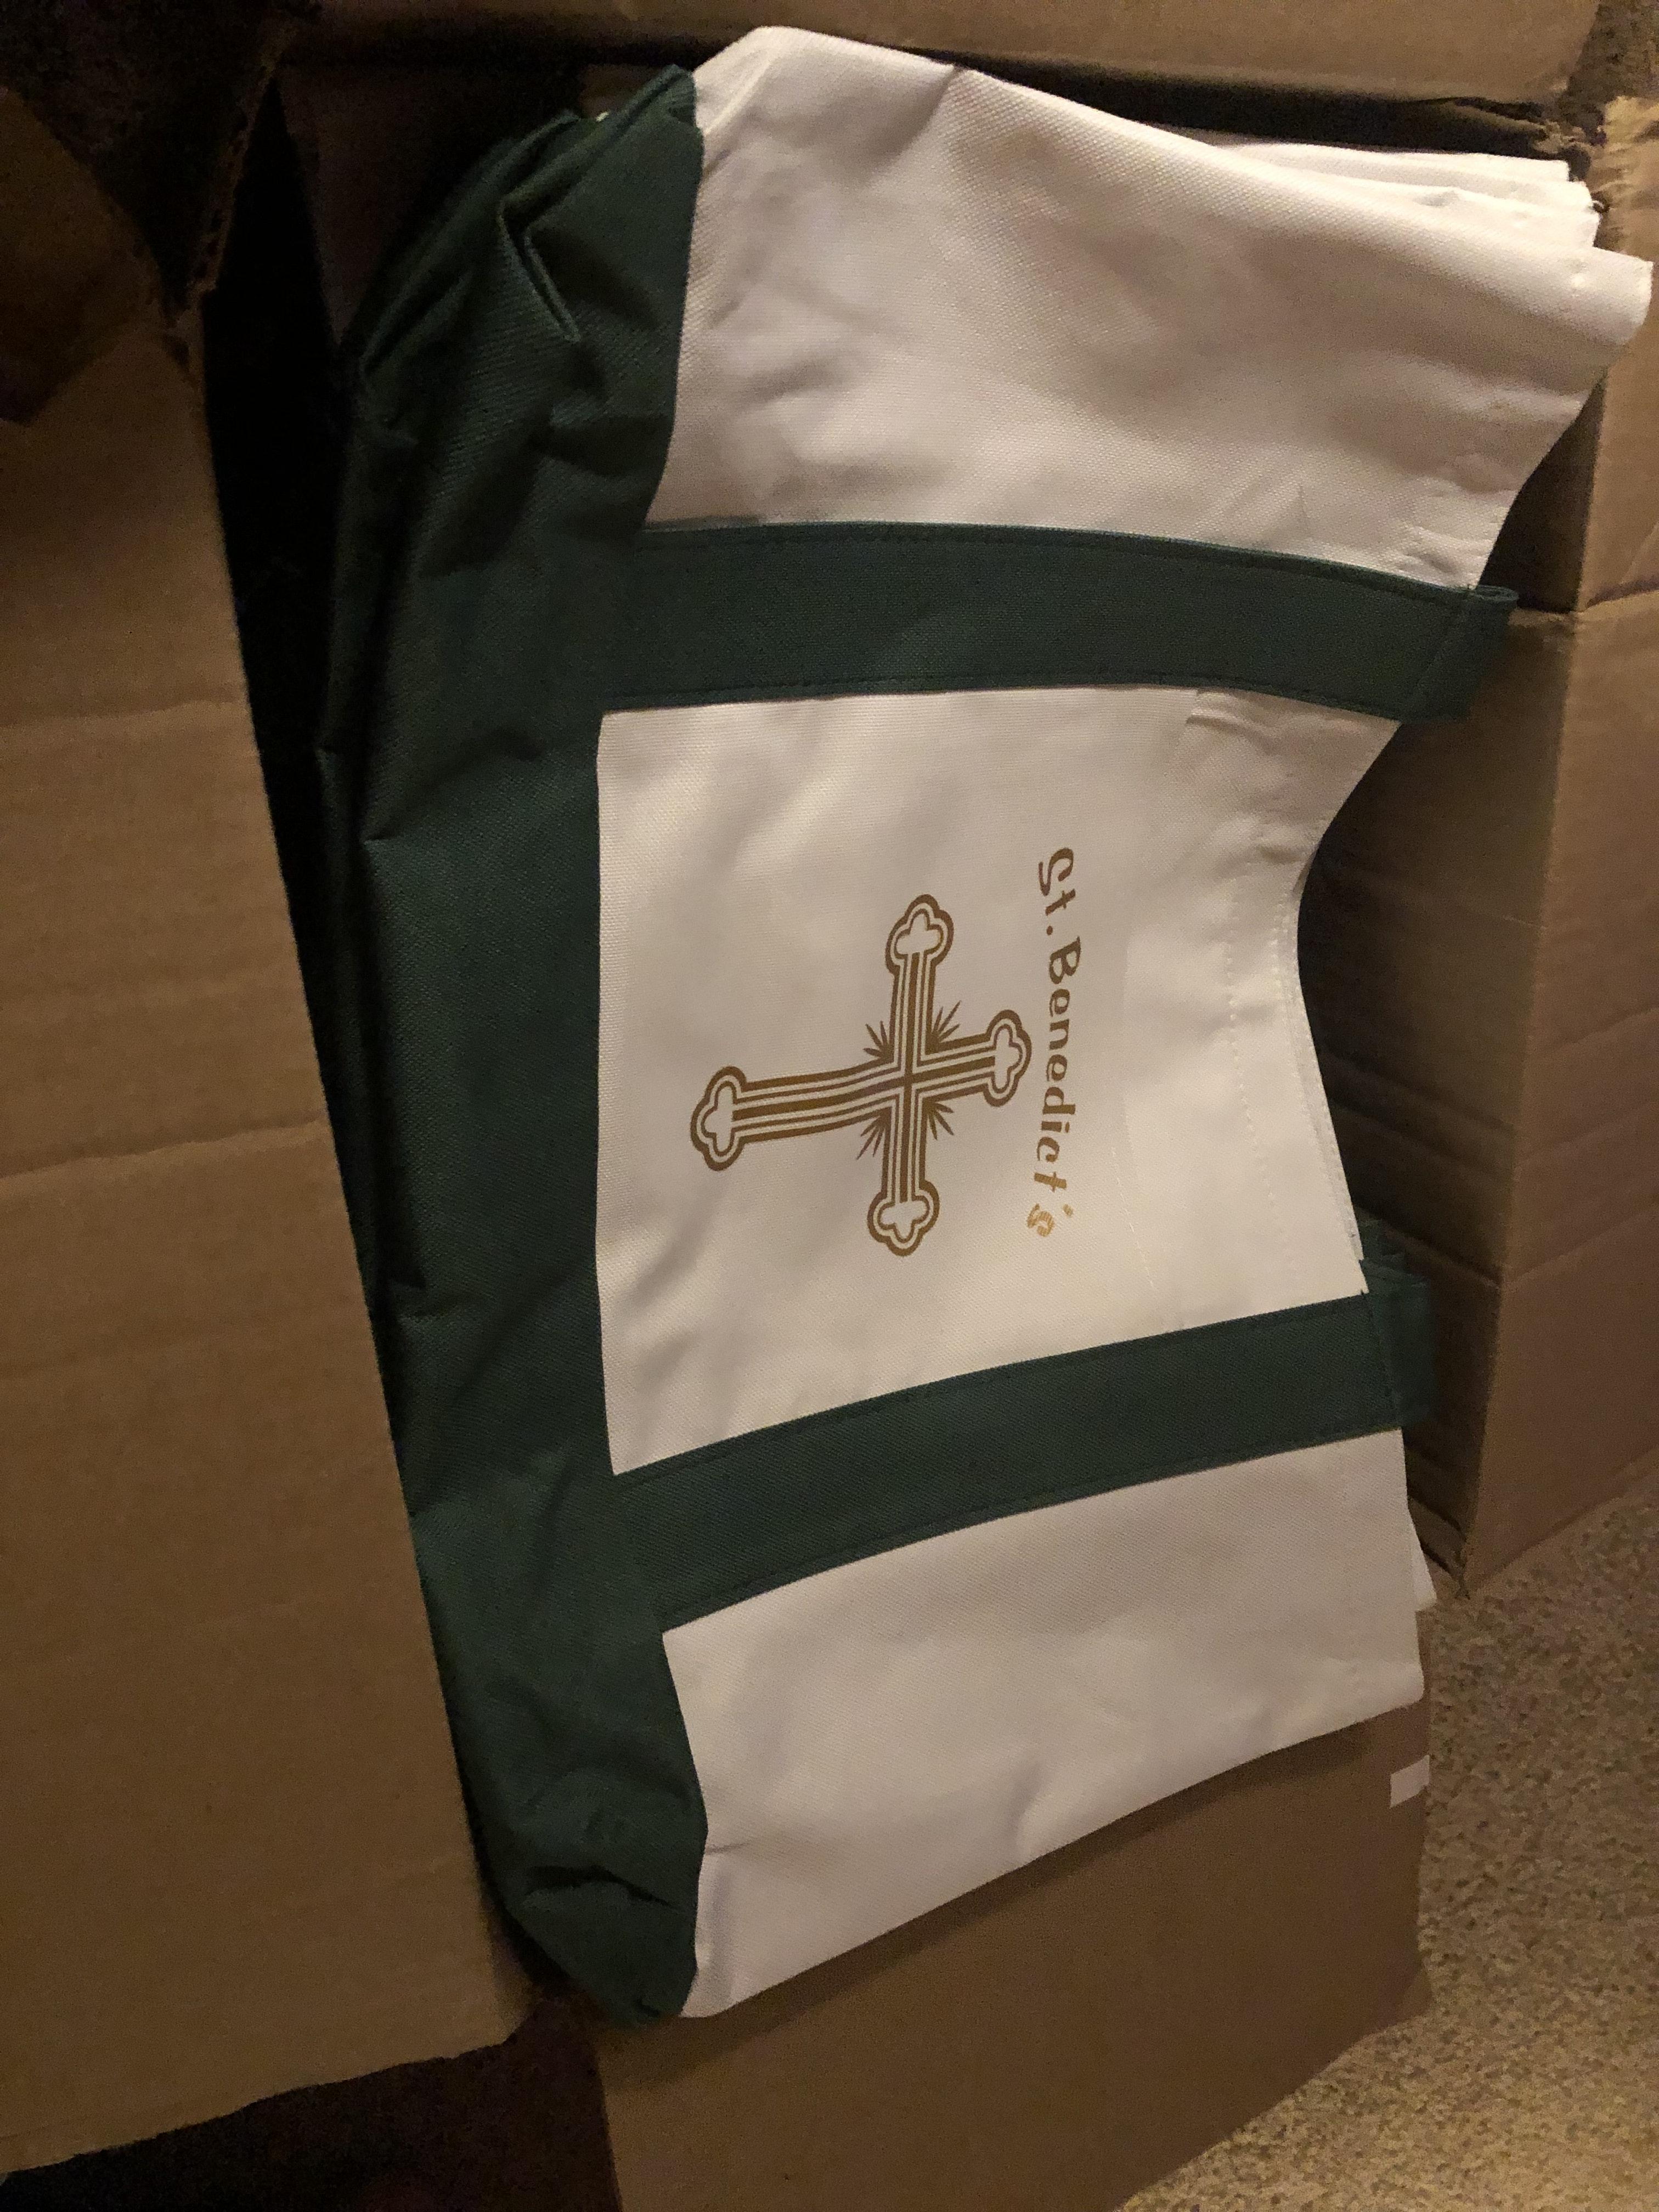 Liberty Bags 7002 customer review by Jenn resor Perfect